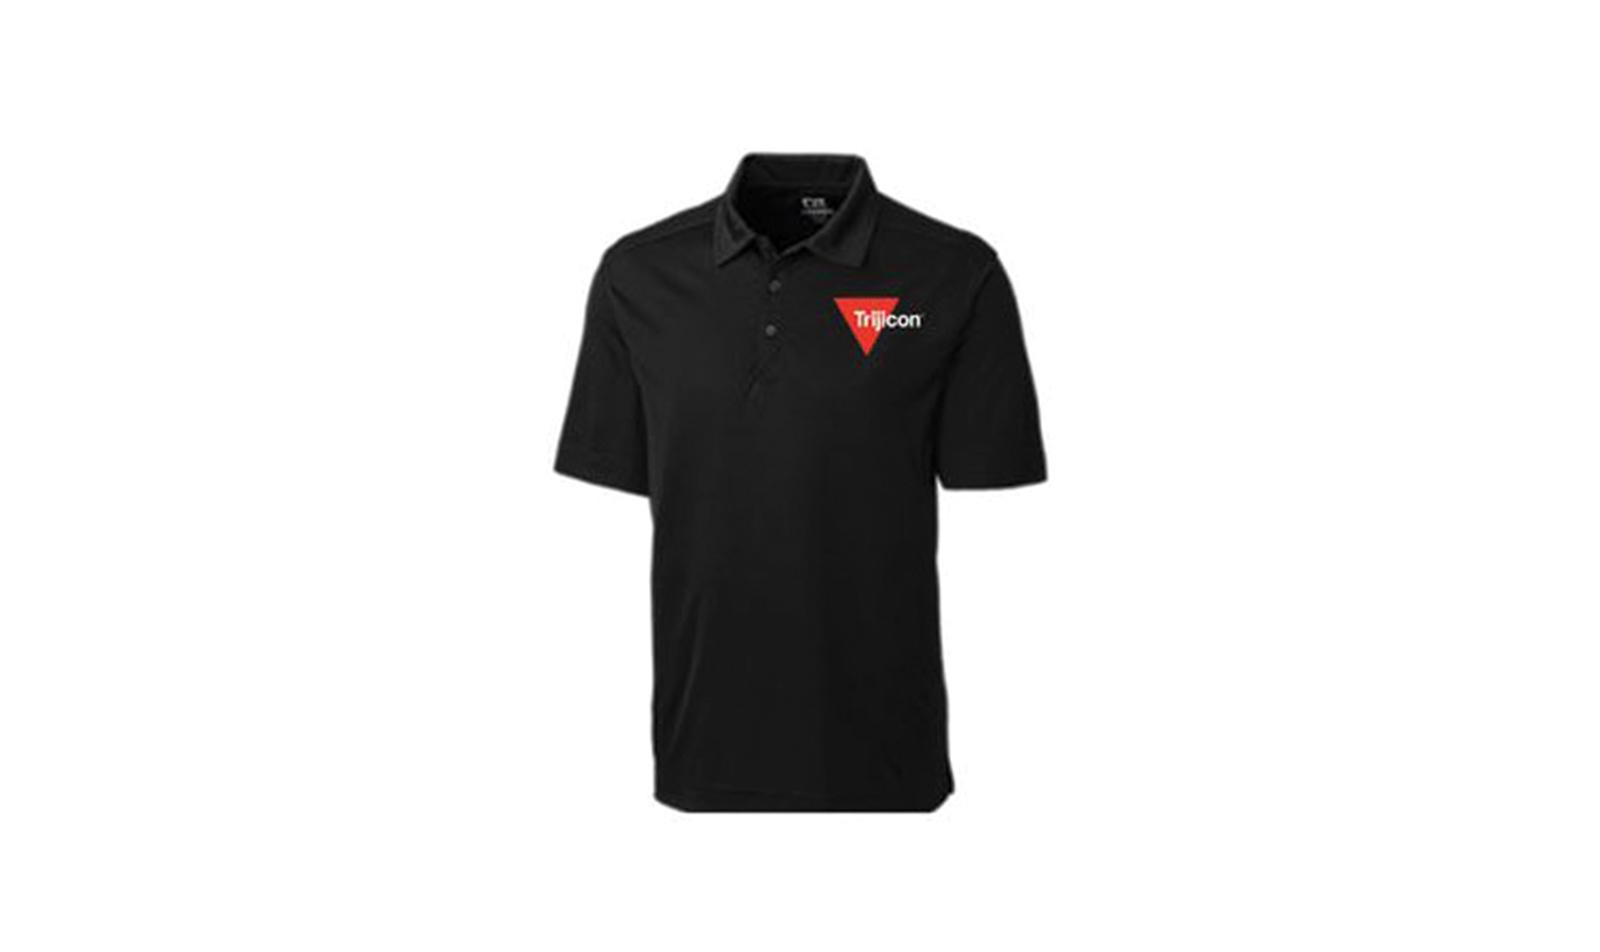 Trijicon<sup>®</sup> Men's Polo - Black - LG